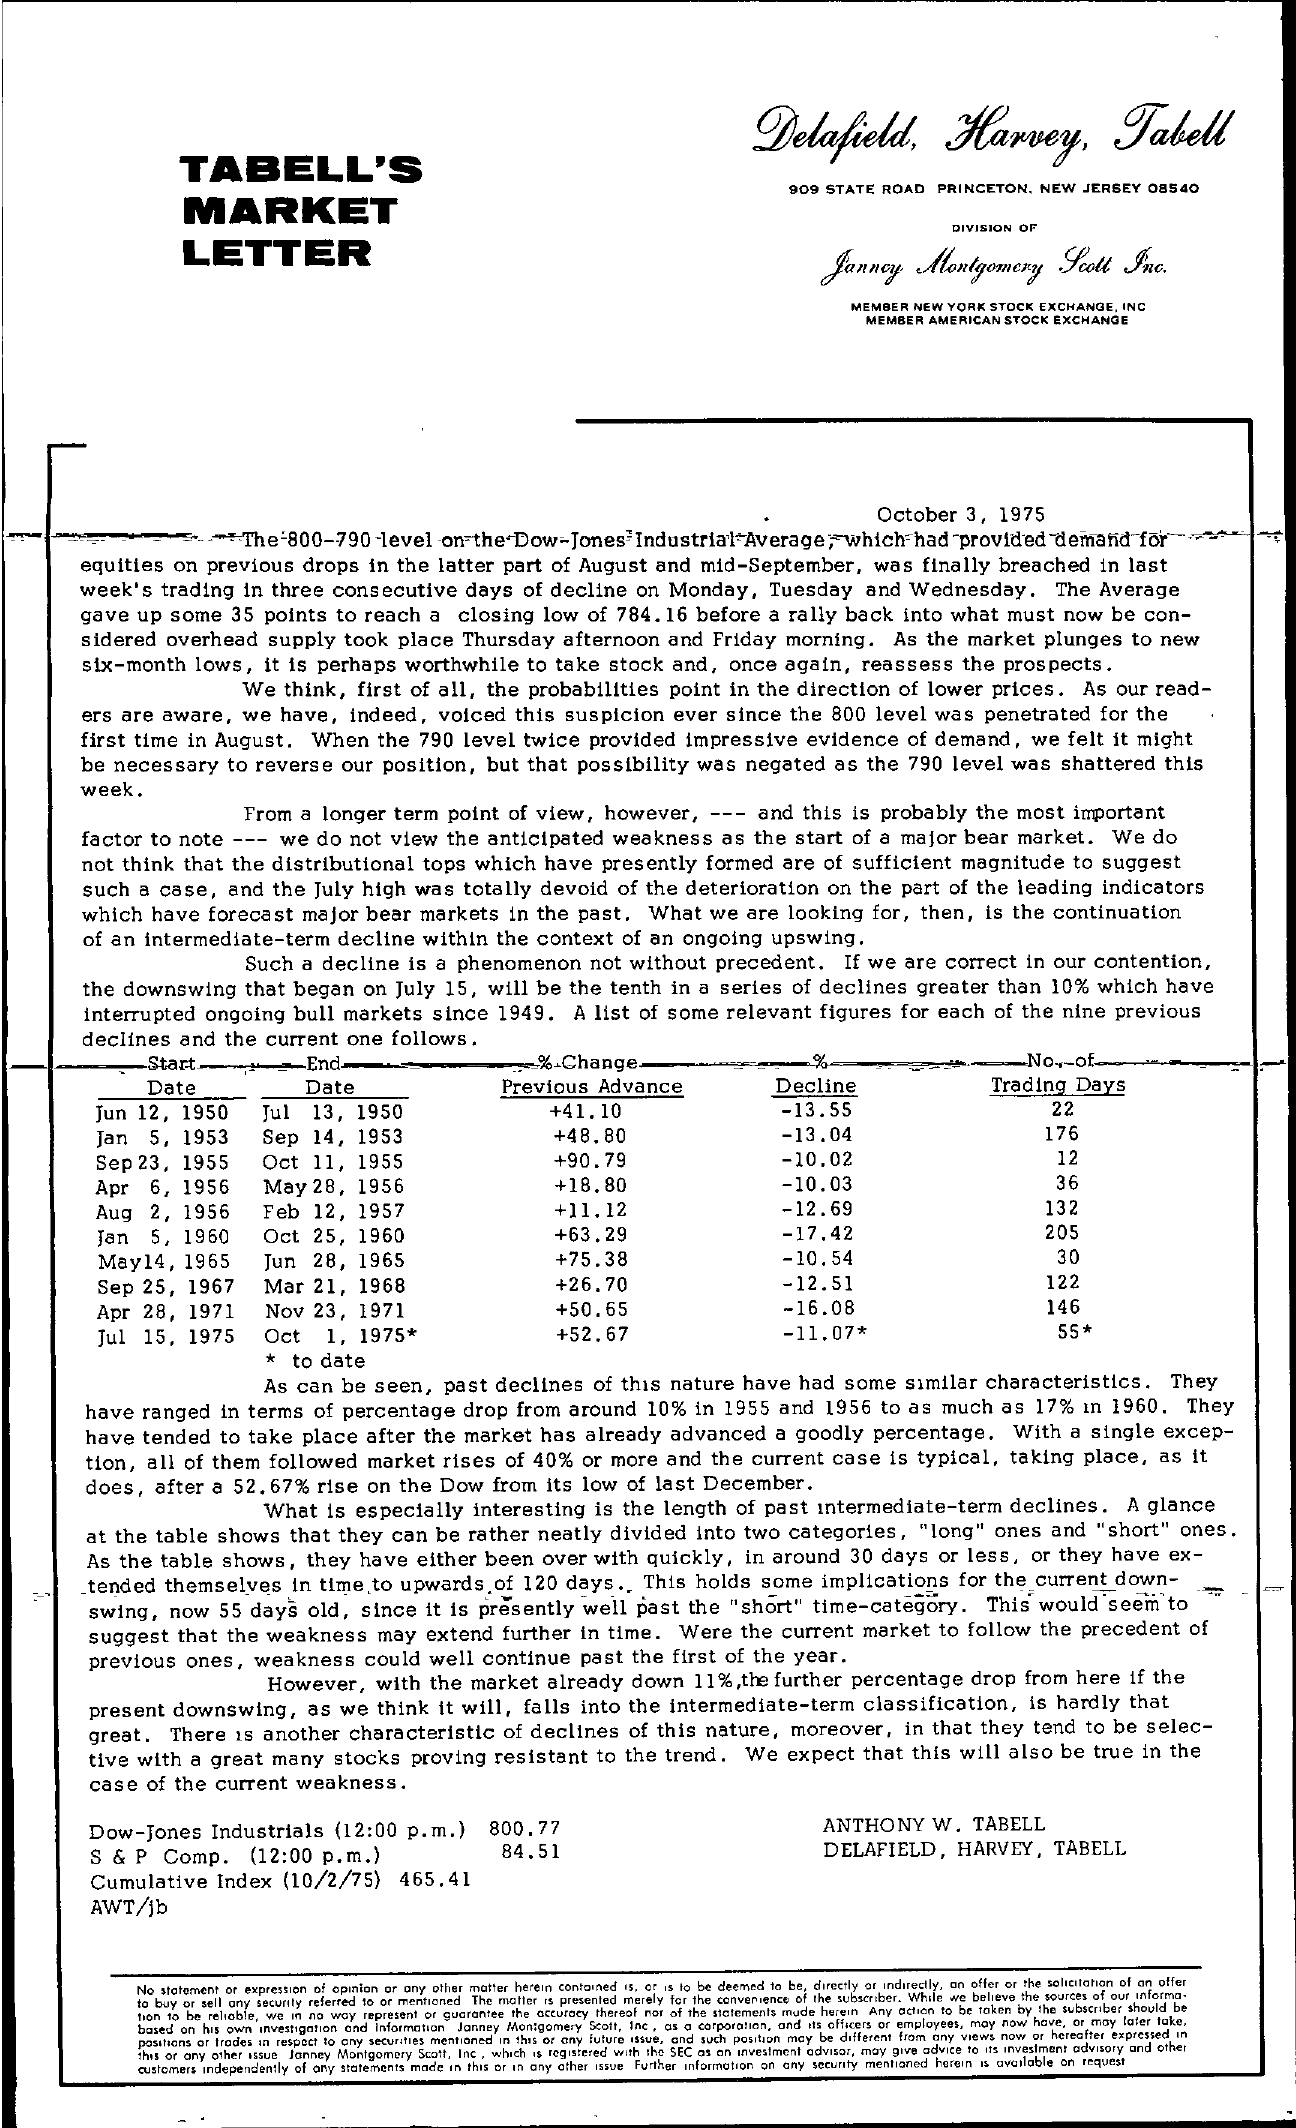 Tabell's Market Letter - October 03, 1975